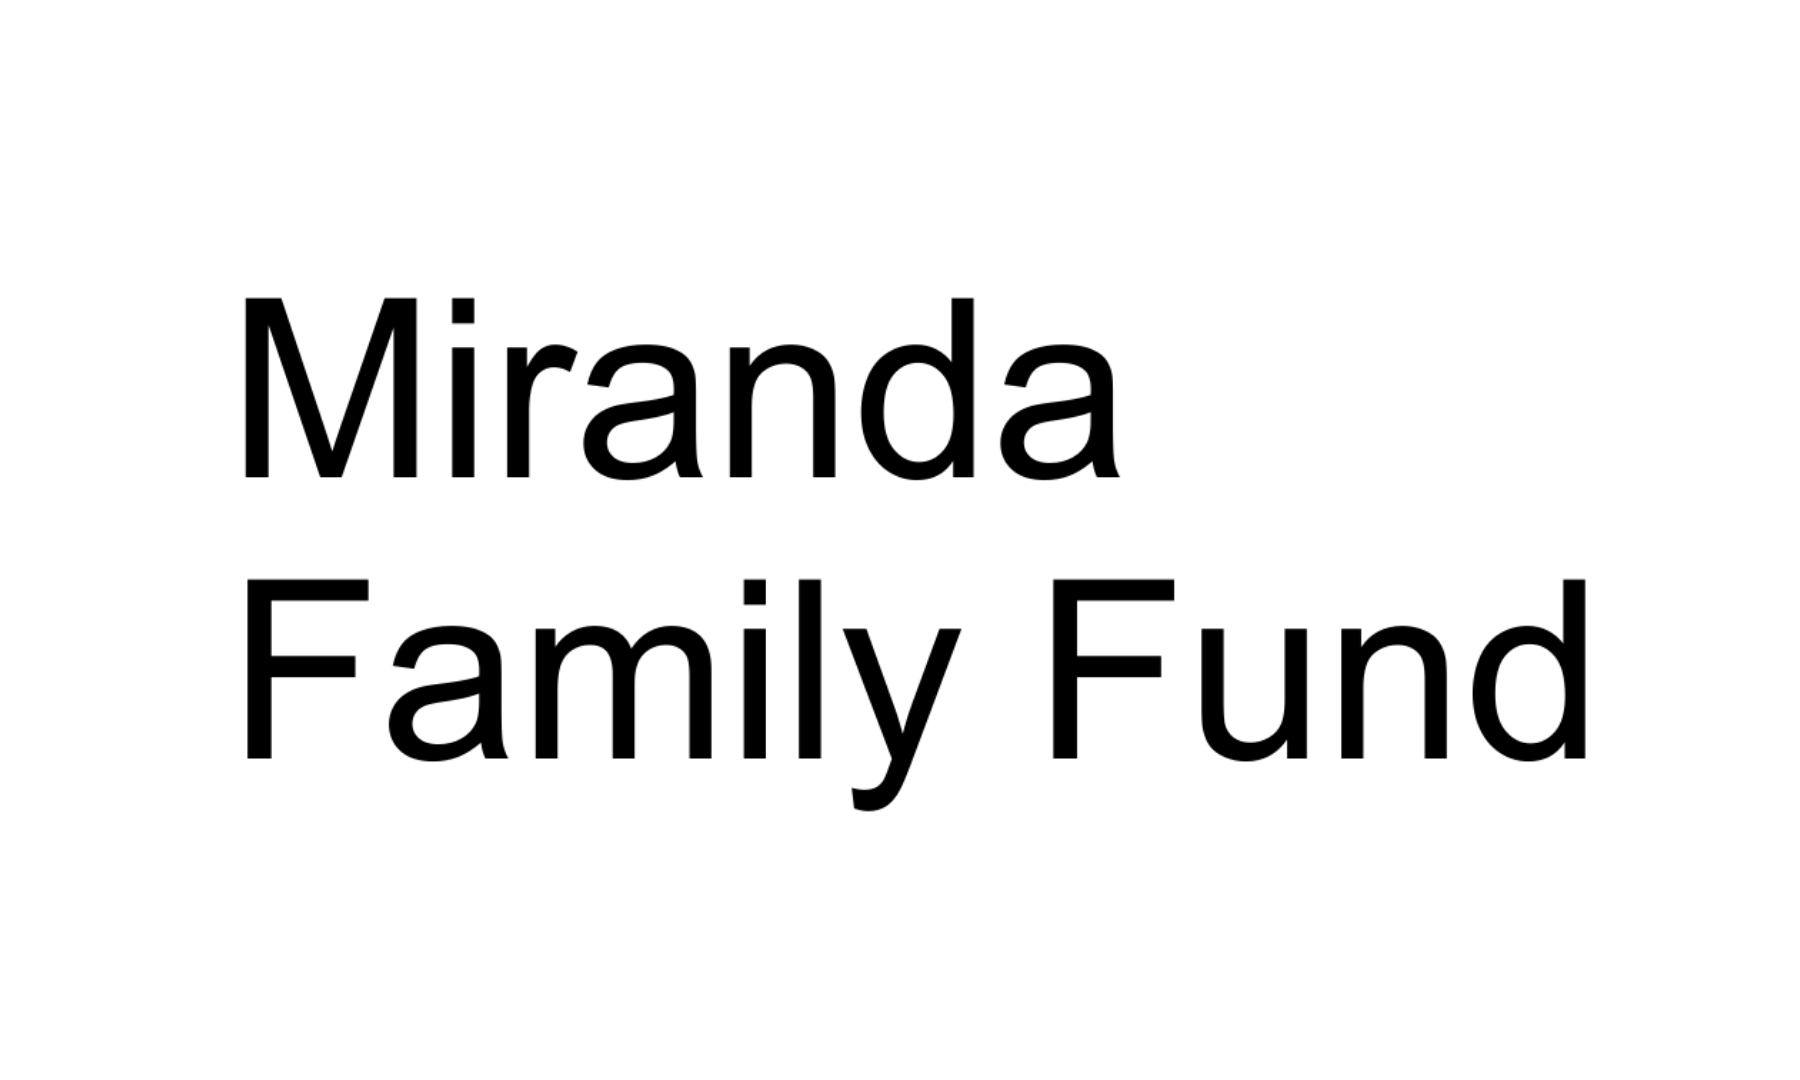 MirandaFamilyFund